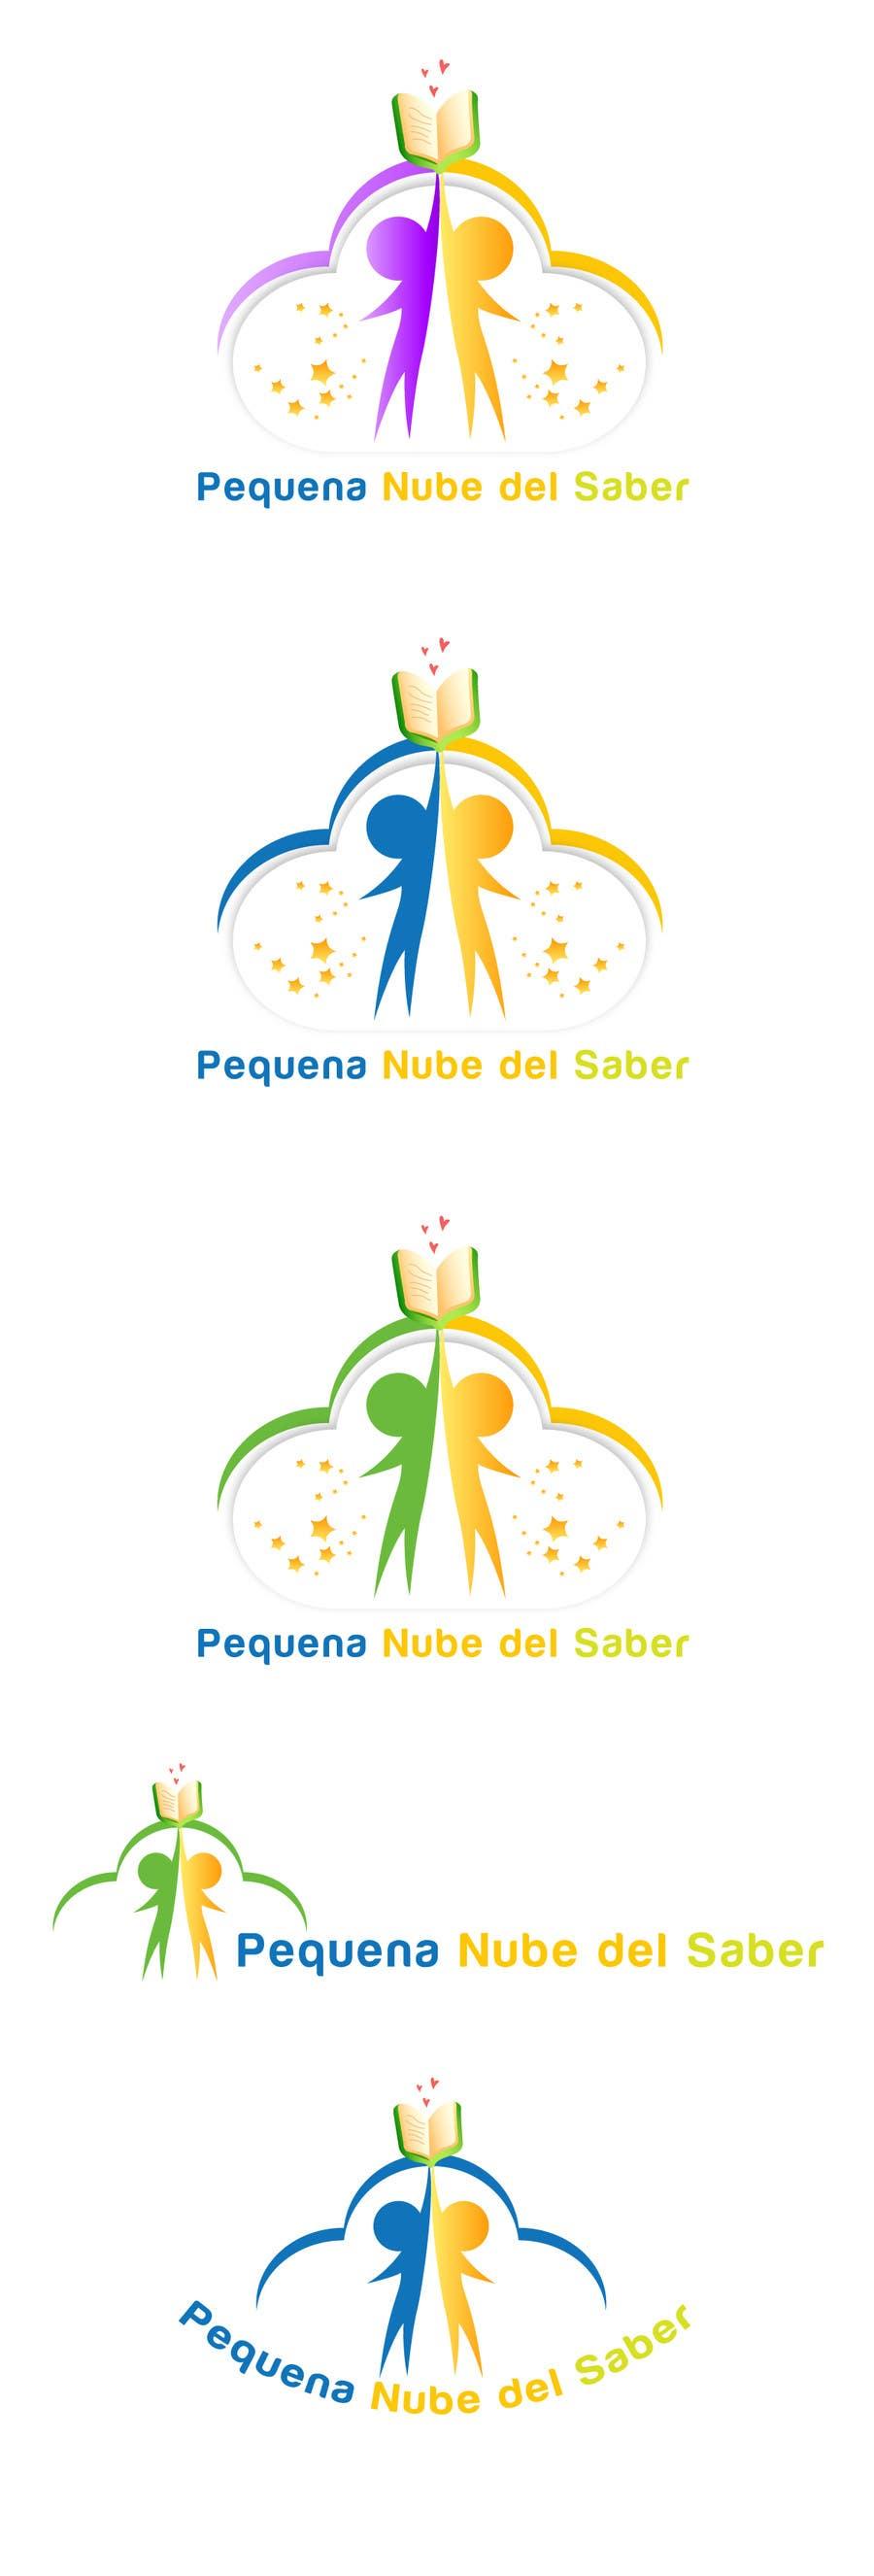 Bài tham dự cuộc thi #116 cho Design a Logo for Little Learning Cloud